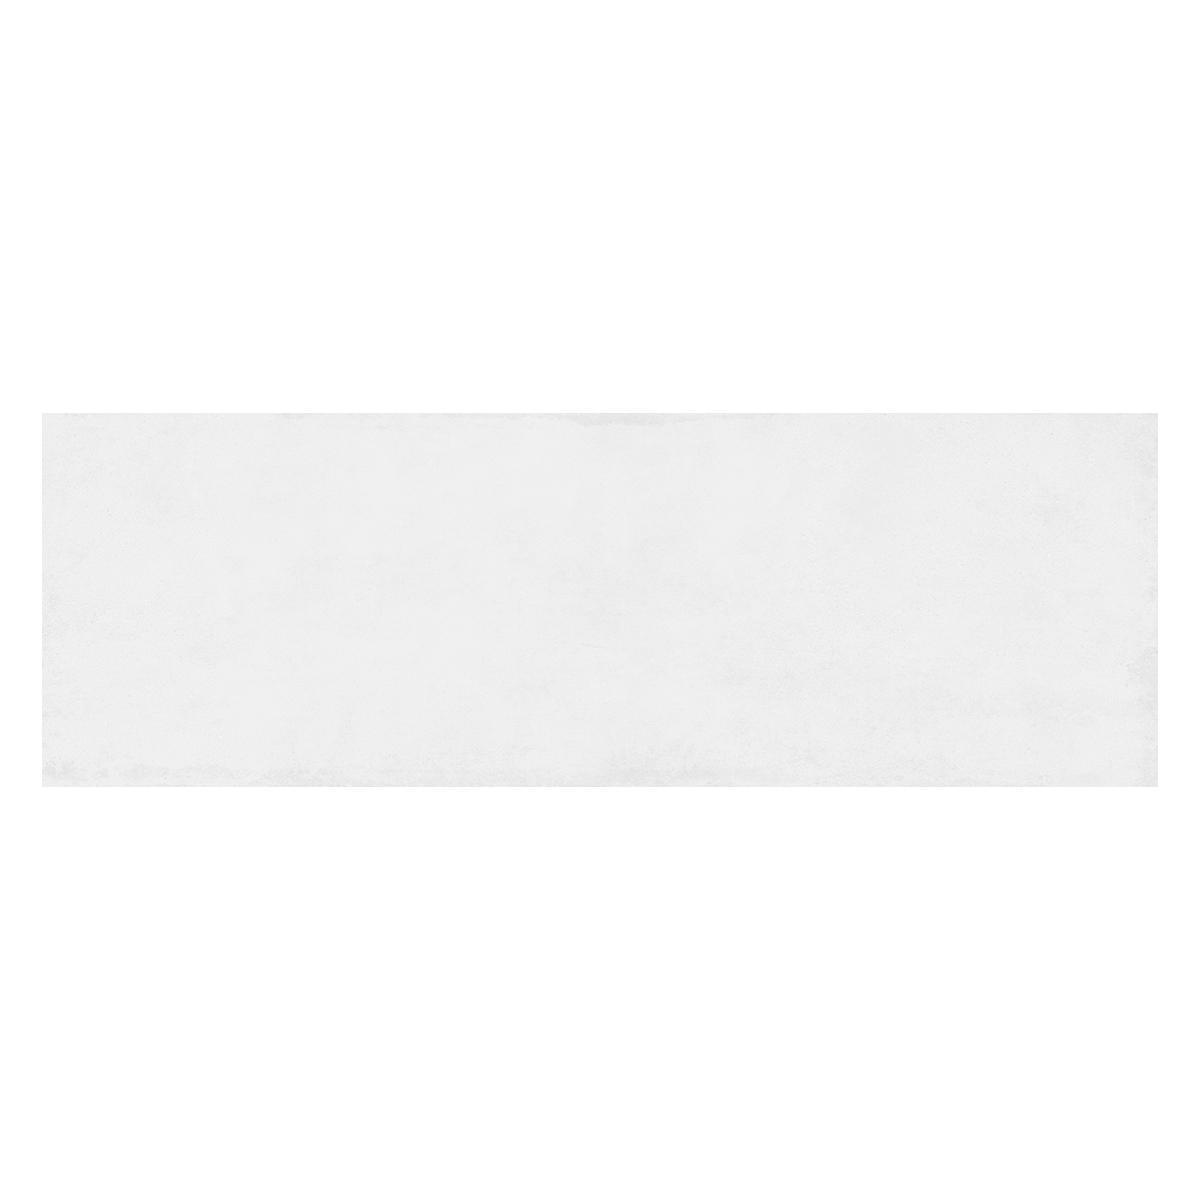 Mayólica Hit Blanco Mate - 20X60 cm - 1.08 m2